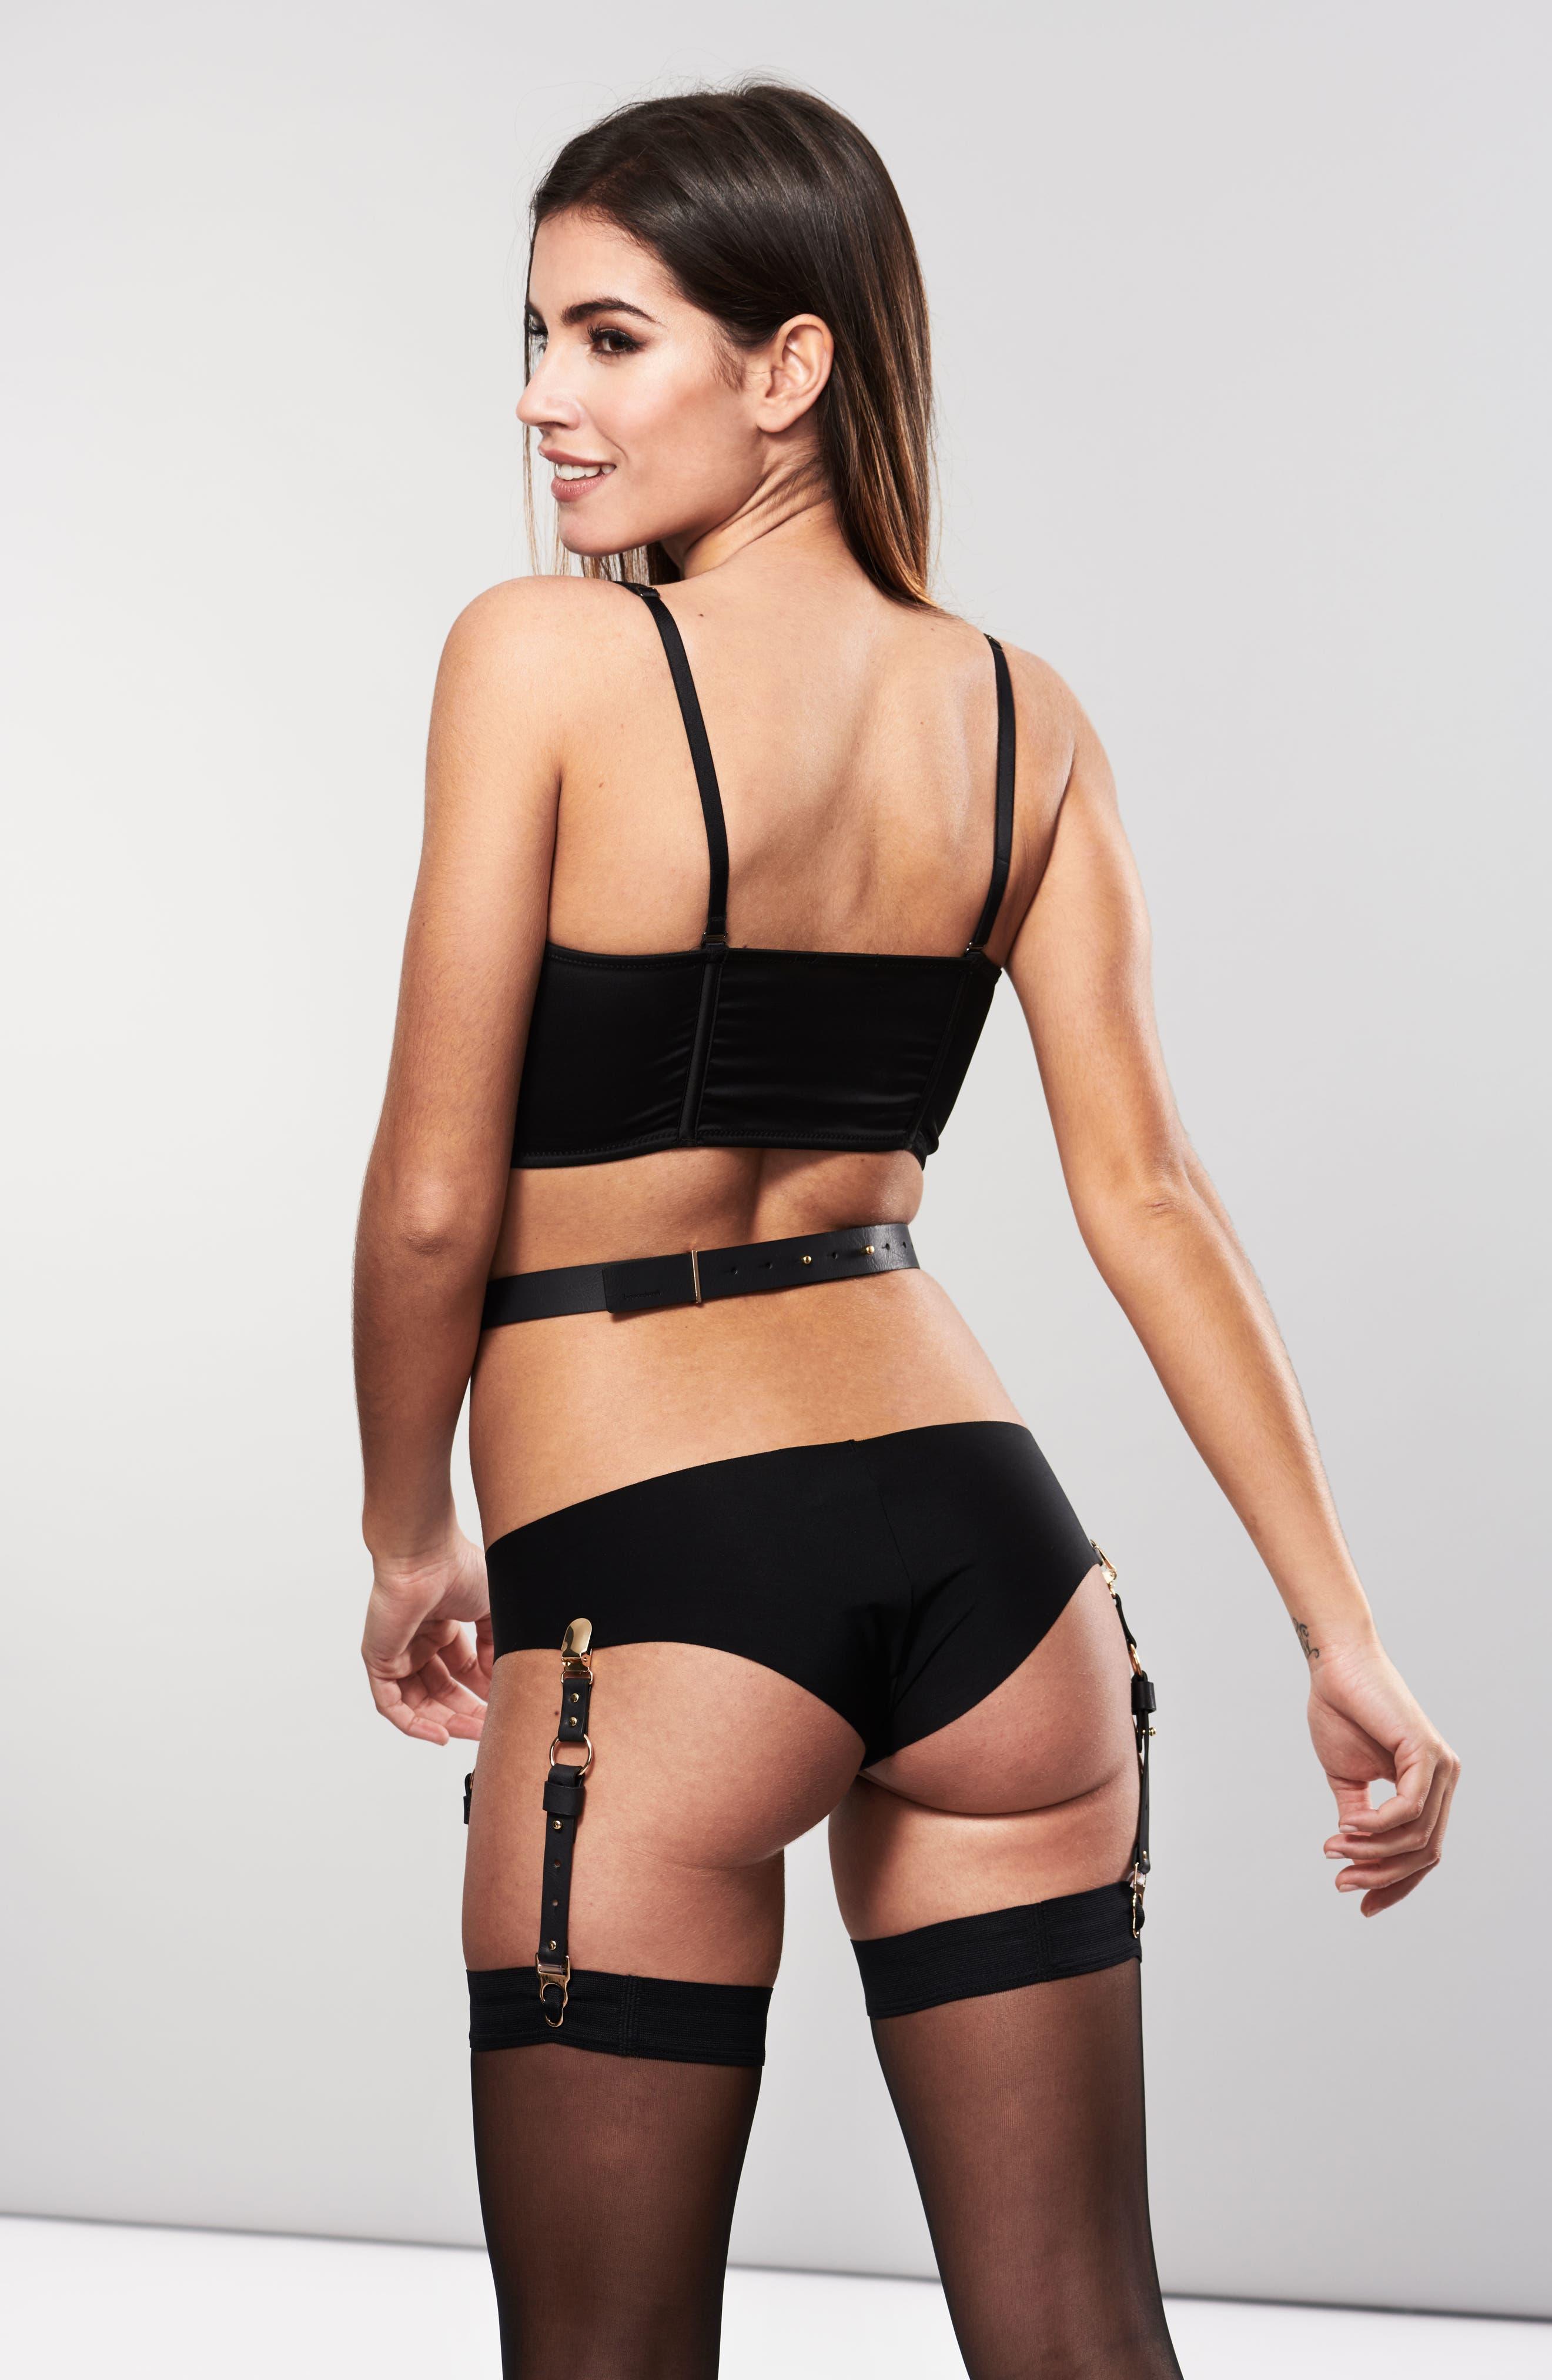 Maze Suspender Belt & Garter Straps,                             Alternate thumbnail 3, color,                             Black